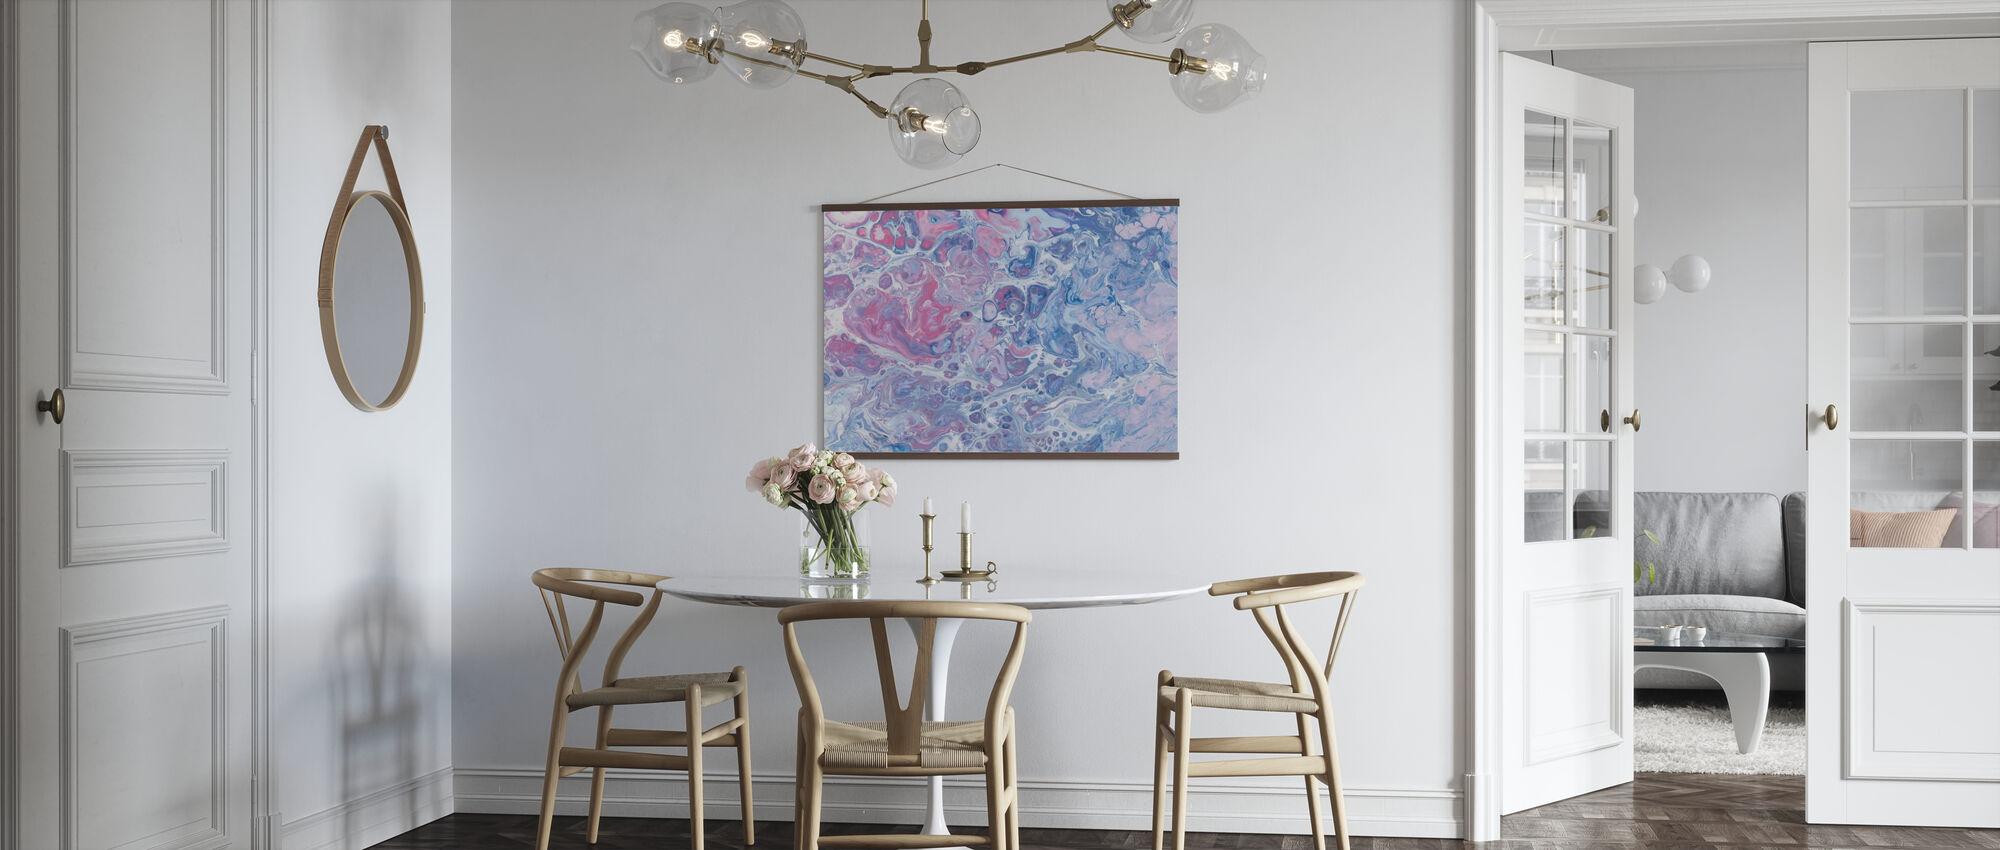 Abstract Visual Art - Poster - Kitchen